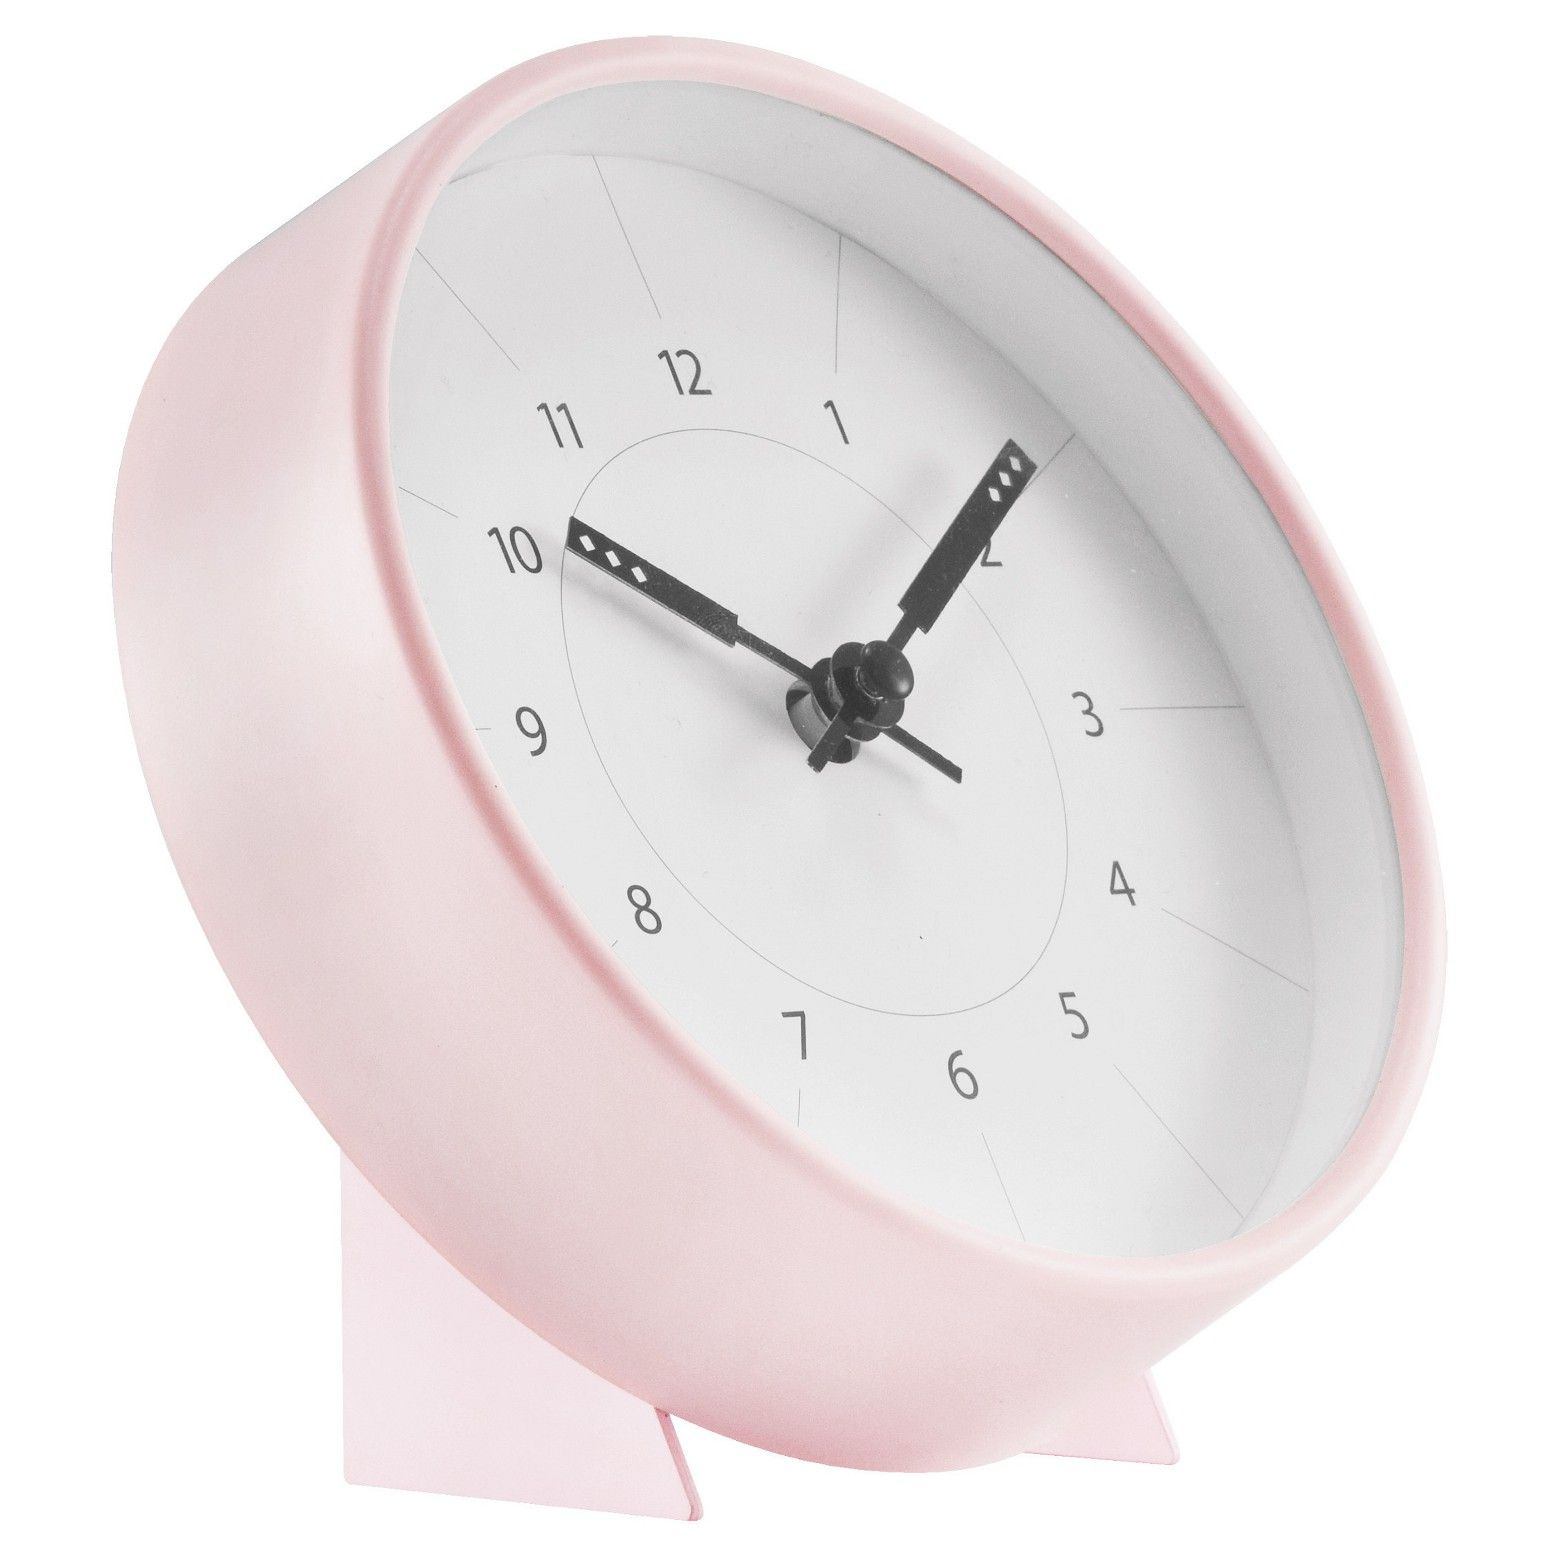 Decorative Table Tope Clock Blush Project 62 Target 6 Dia Tabletop Or Hang Clock Decor Clock Wall Clock Modern